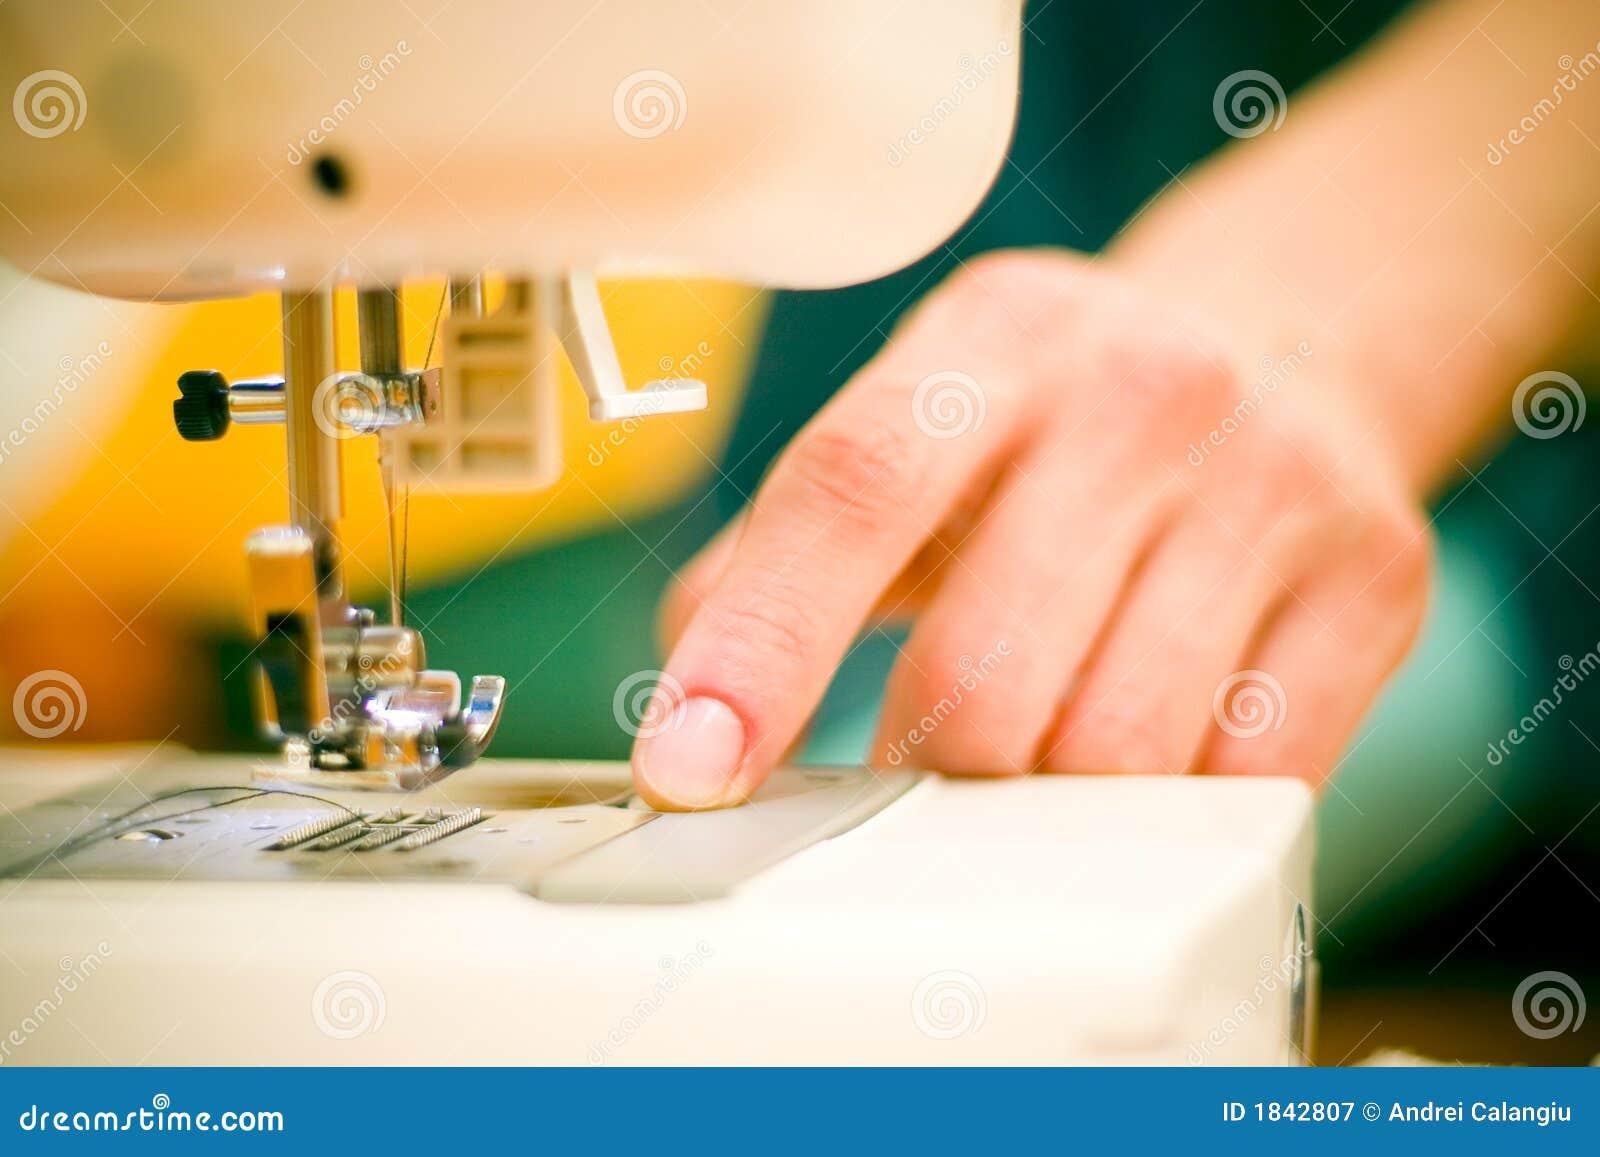 Woman at sewing machine.